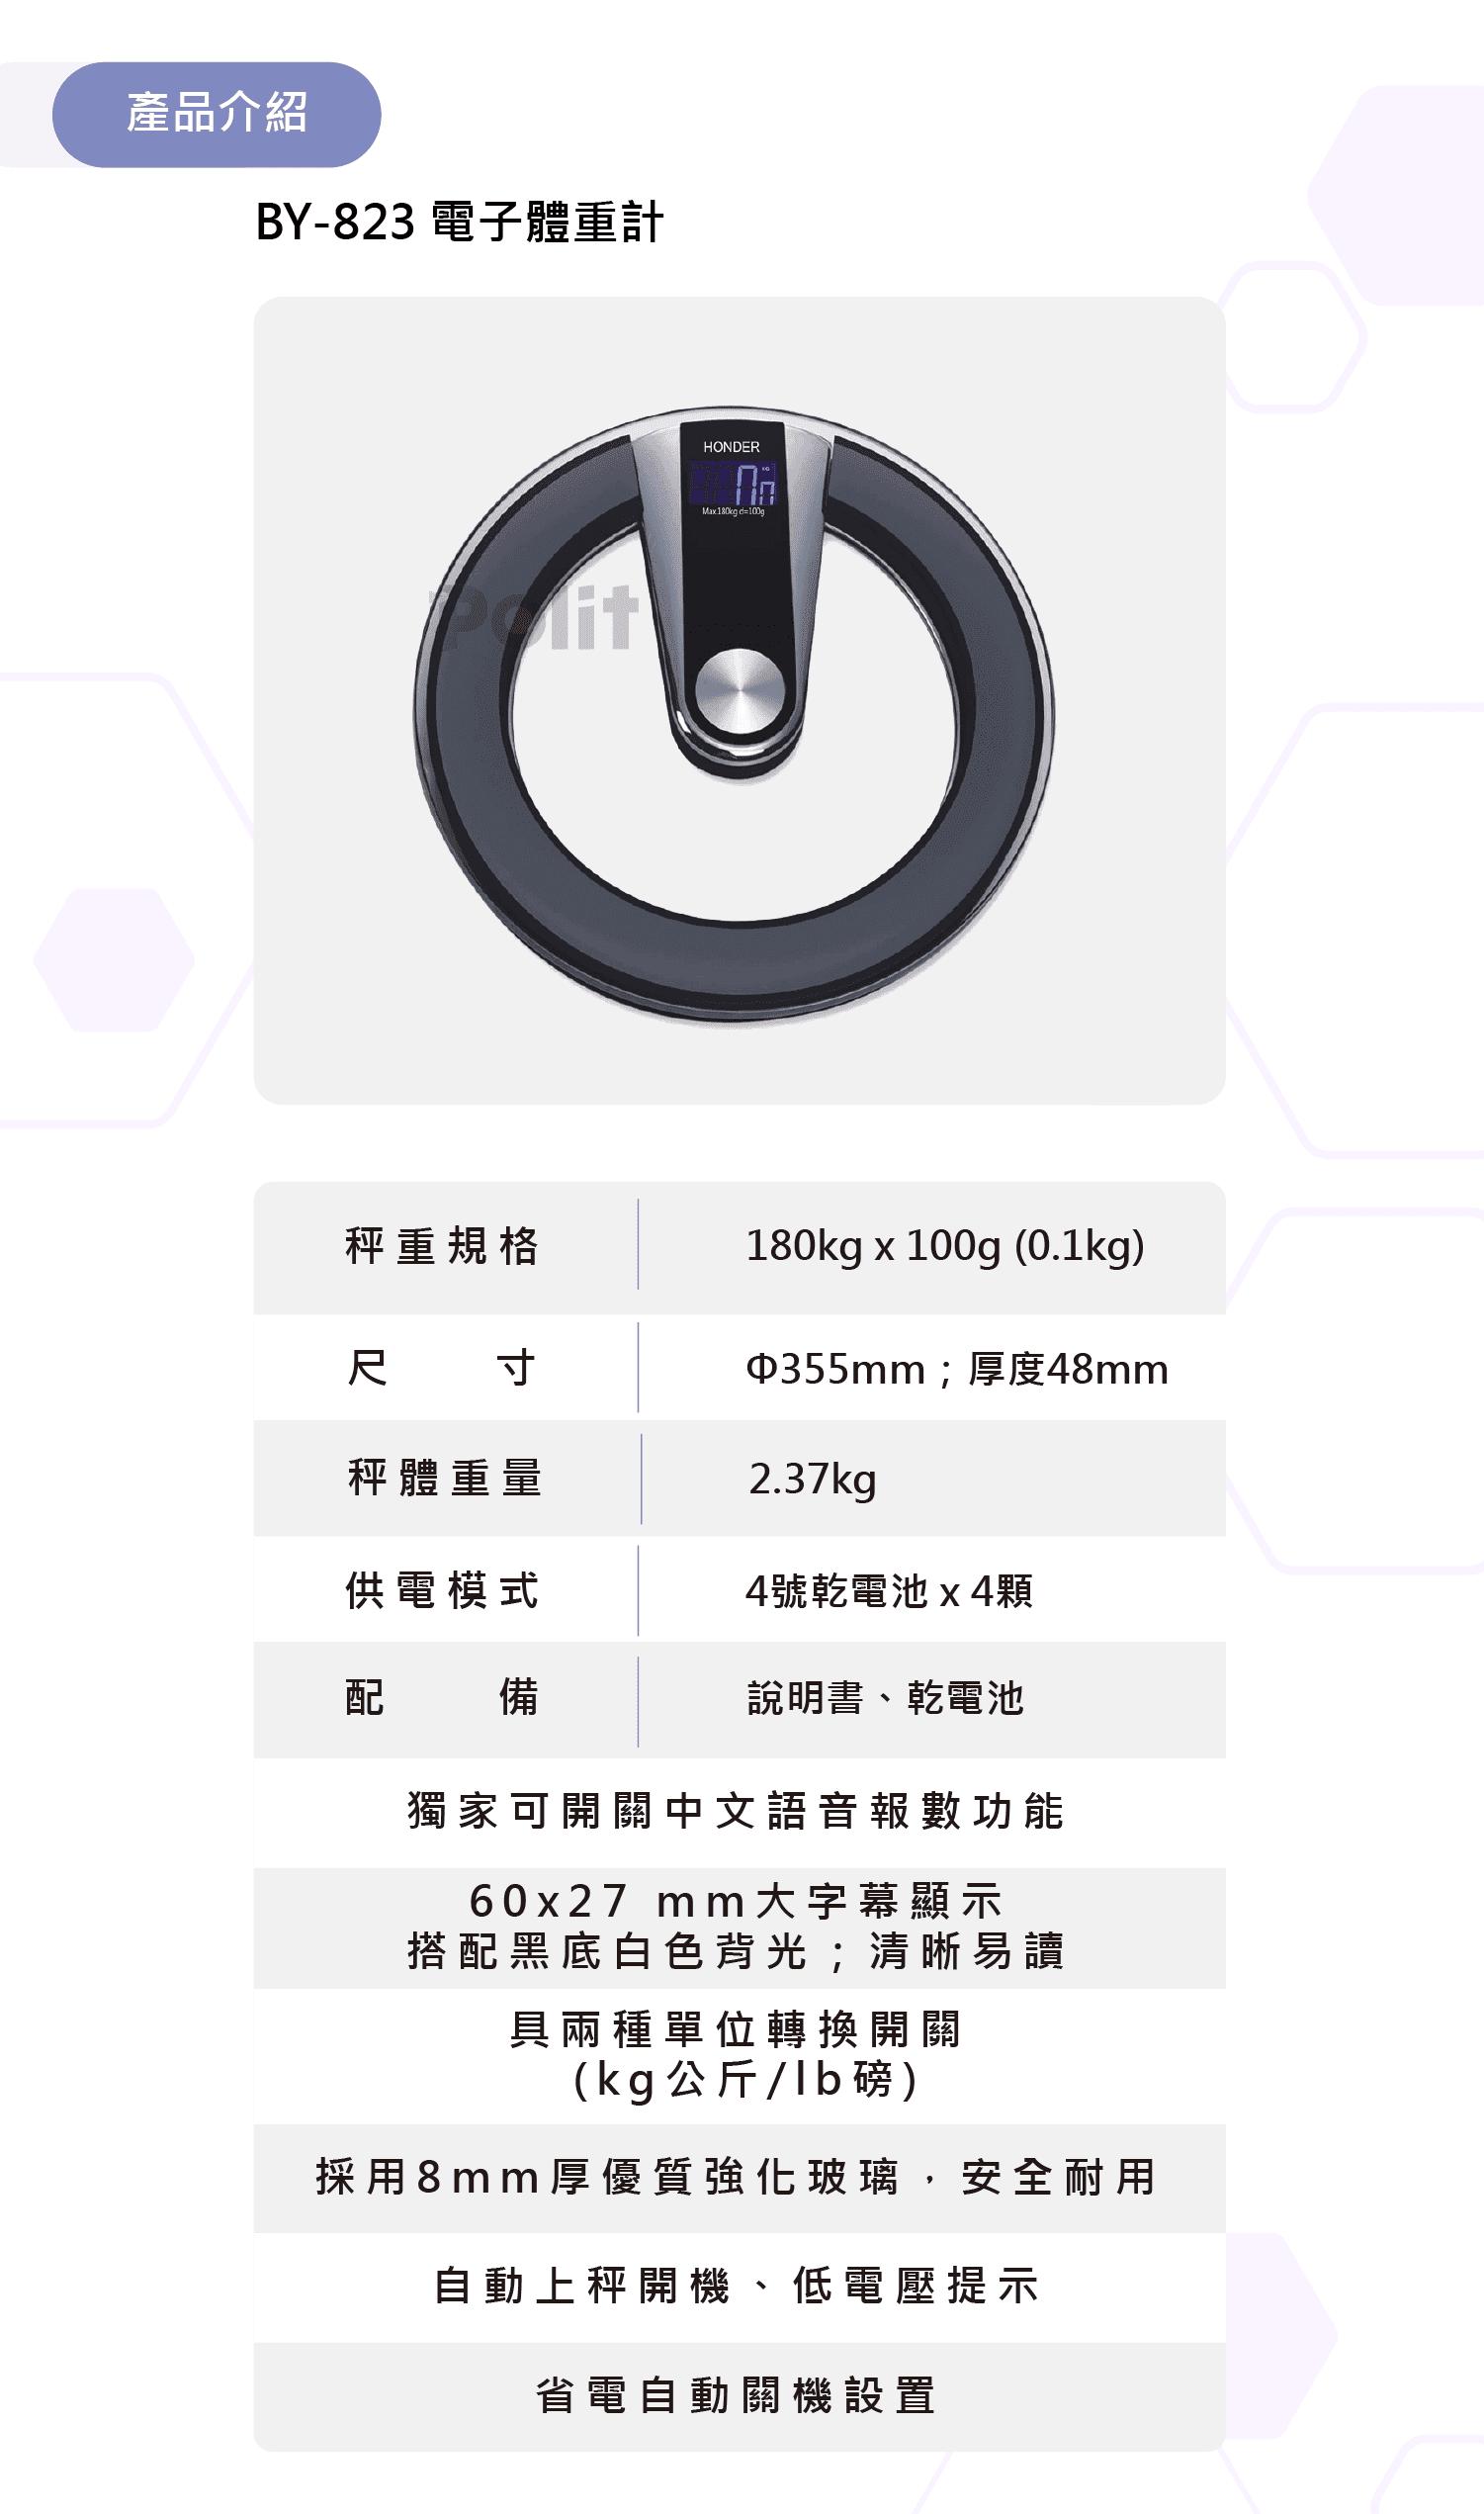 BY-828 電子體重計 | 沛禮國際 Polit 電子秤專賣